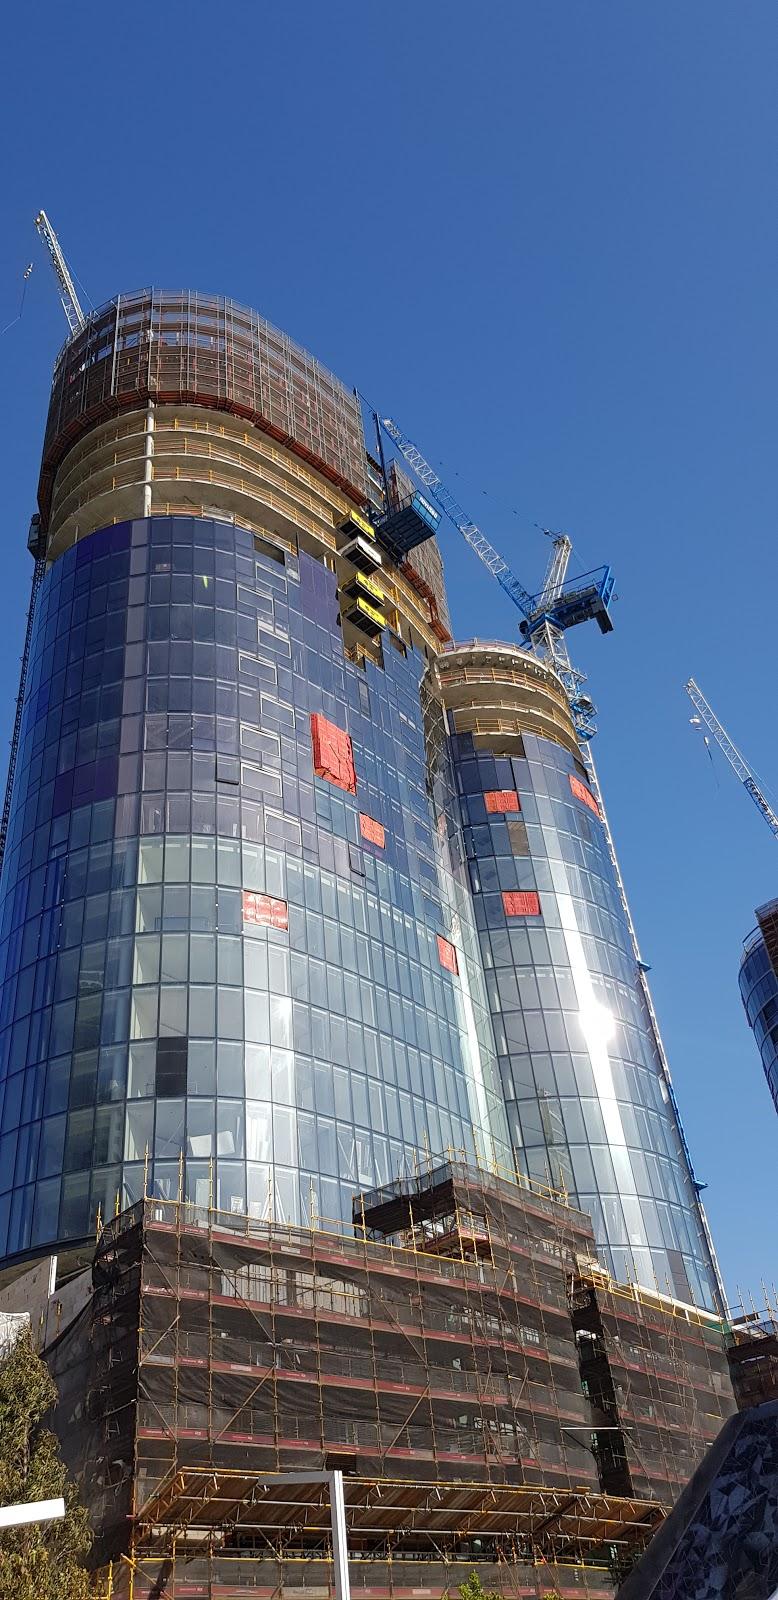 The Ritz-Carlton | lodging | Perth WA 6000, Australia